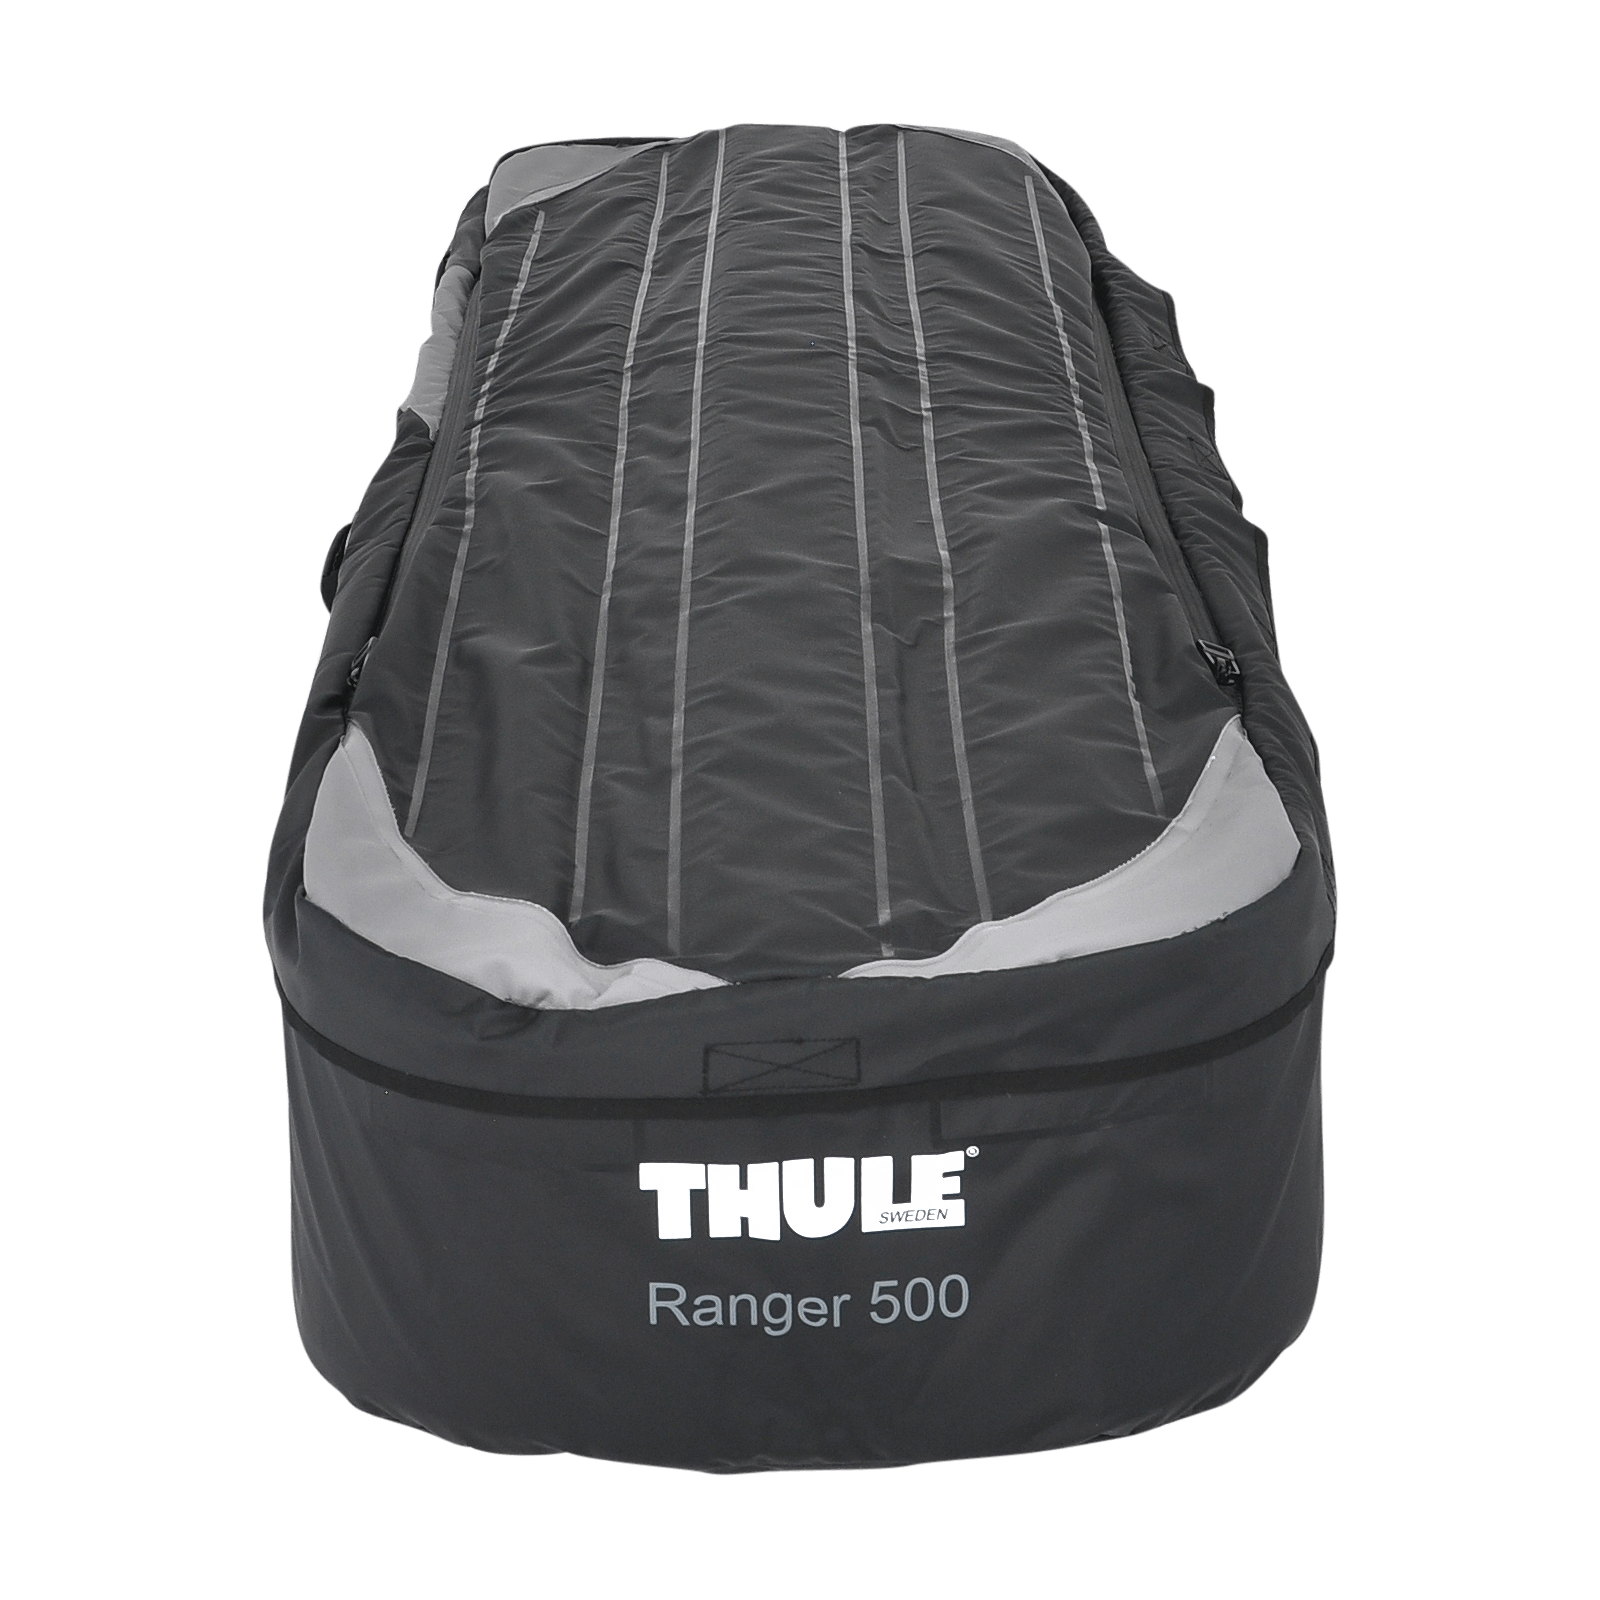 Dachbox Thule Ranger 500 Black/Silver Gray - Bild 3